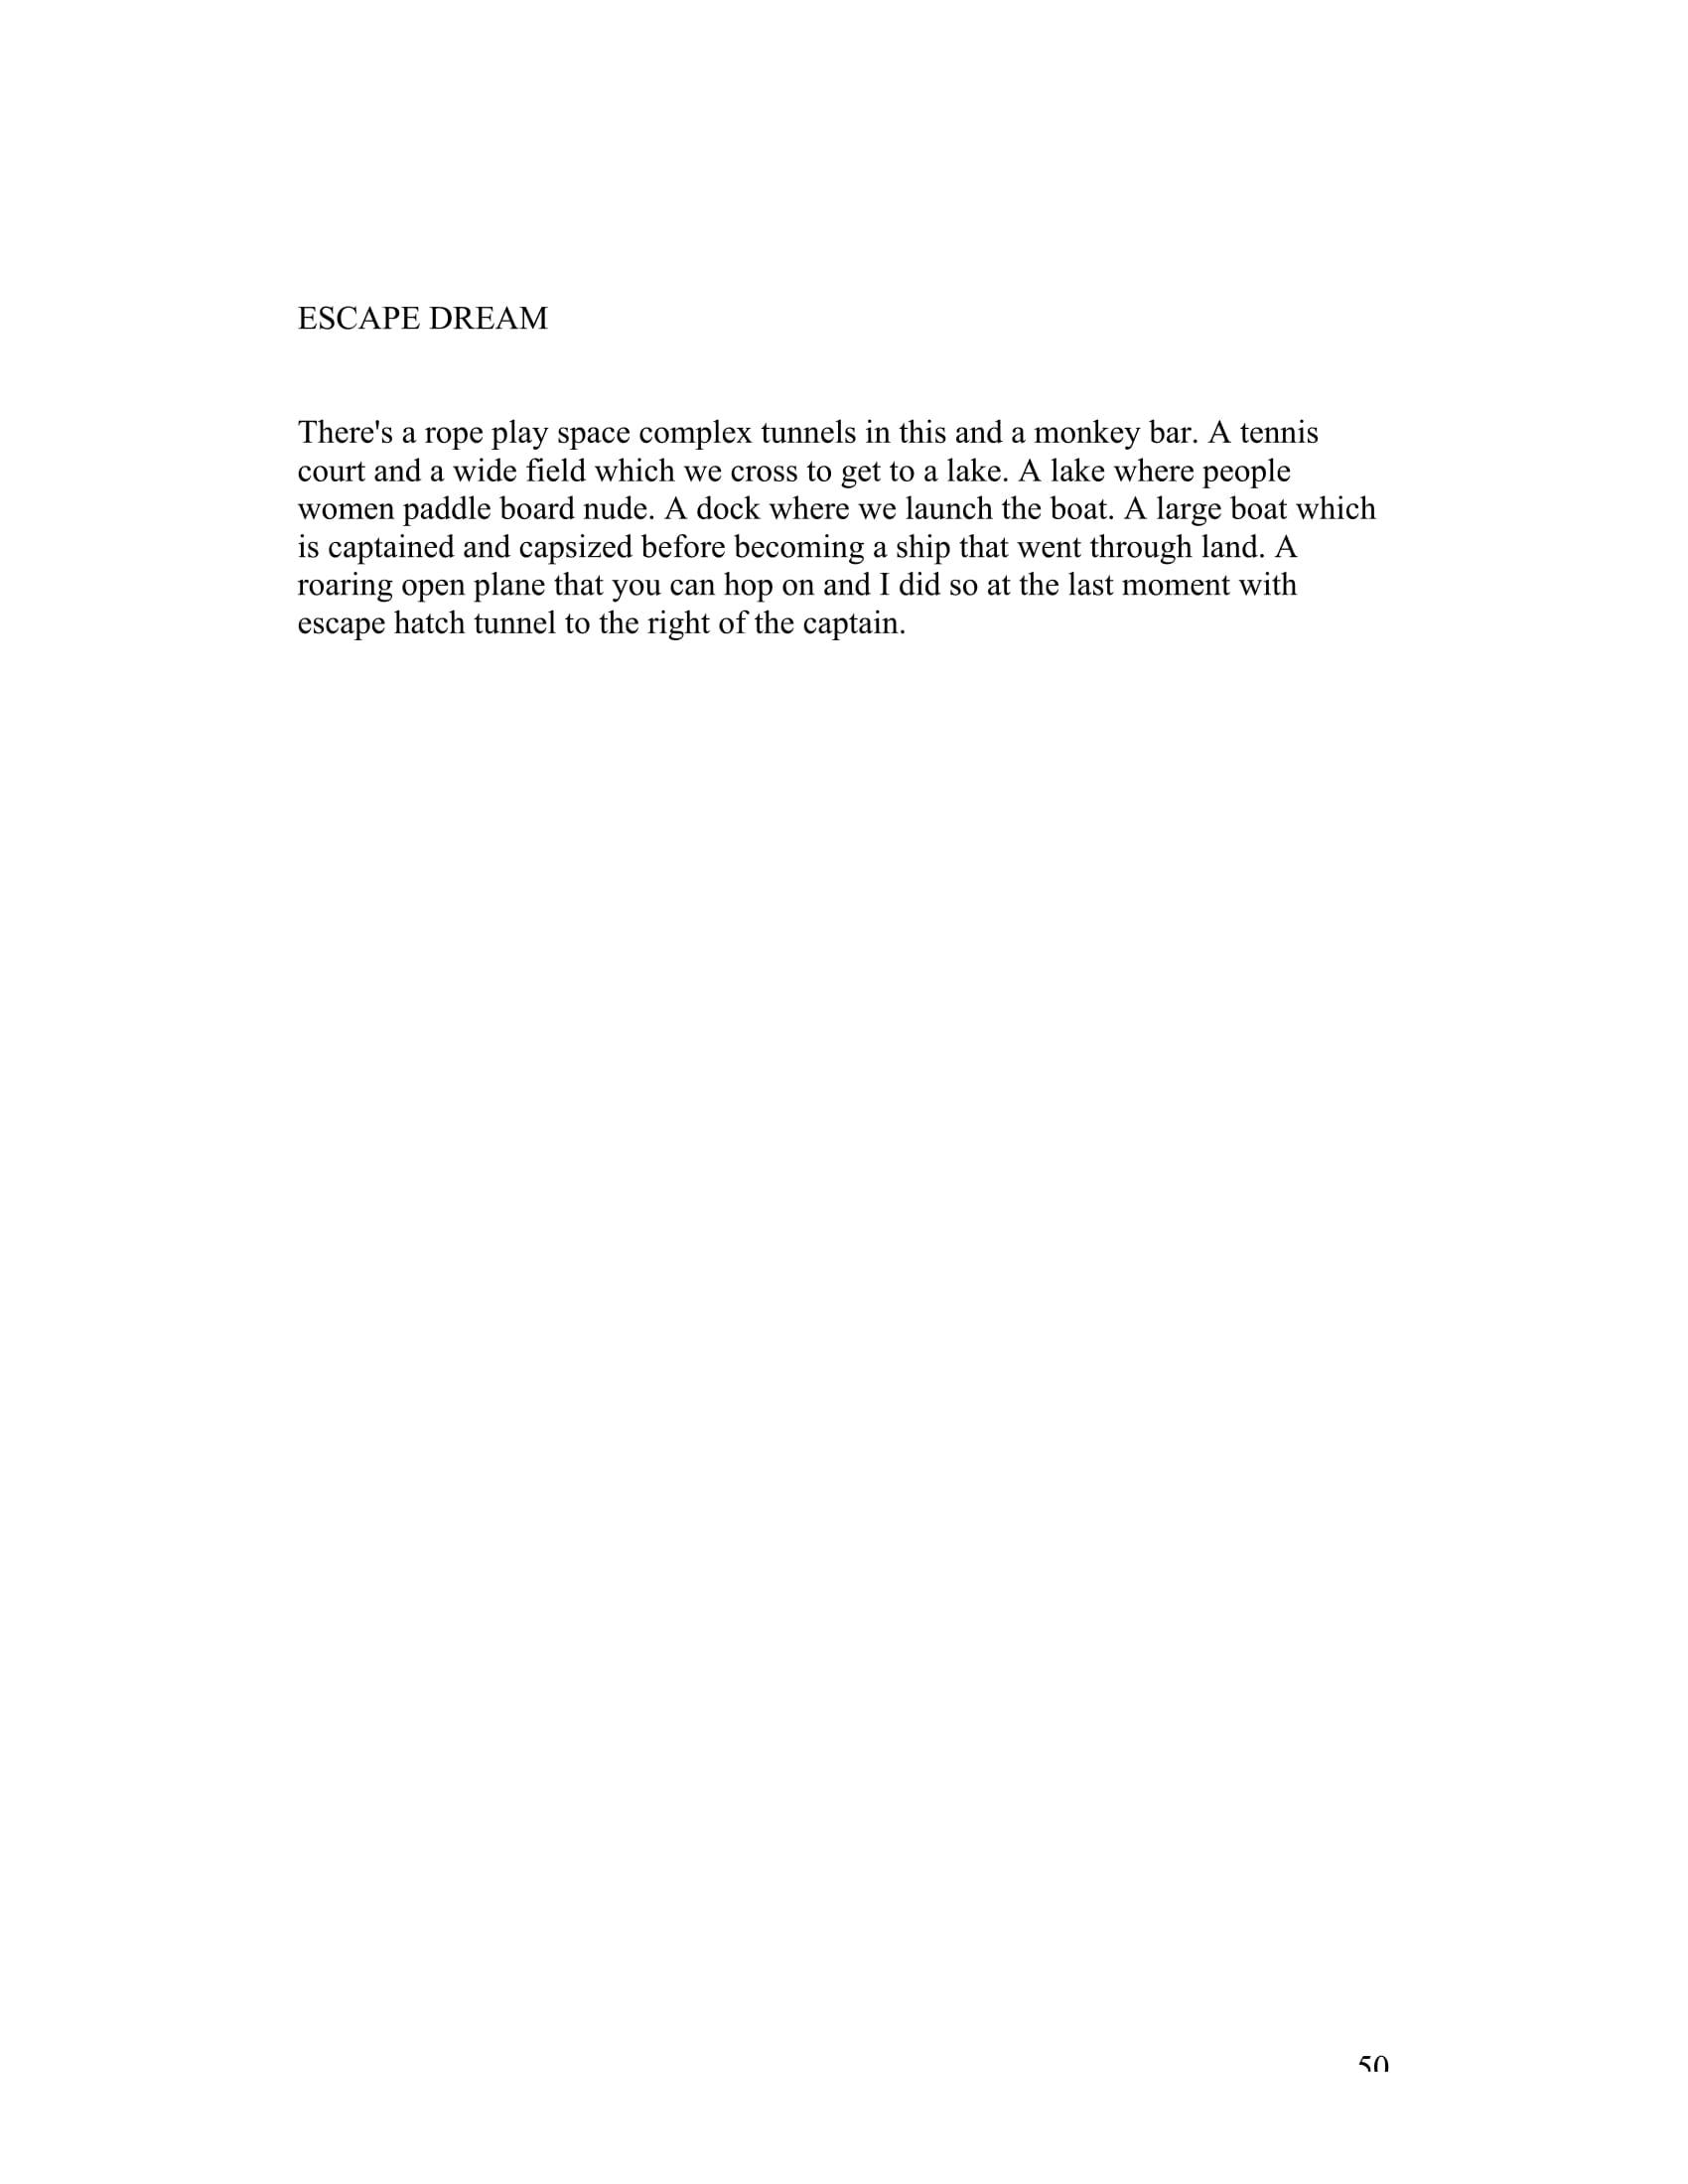 2017.10.31 UNWINDING PAGE-50.jpg